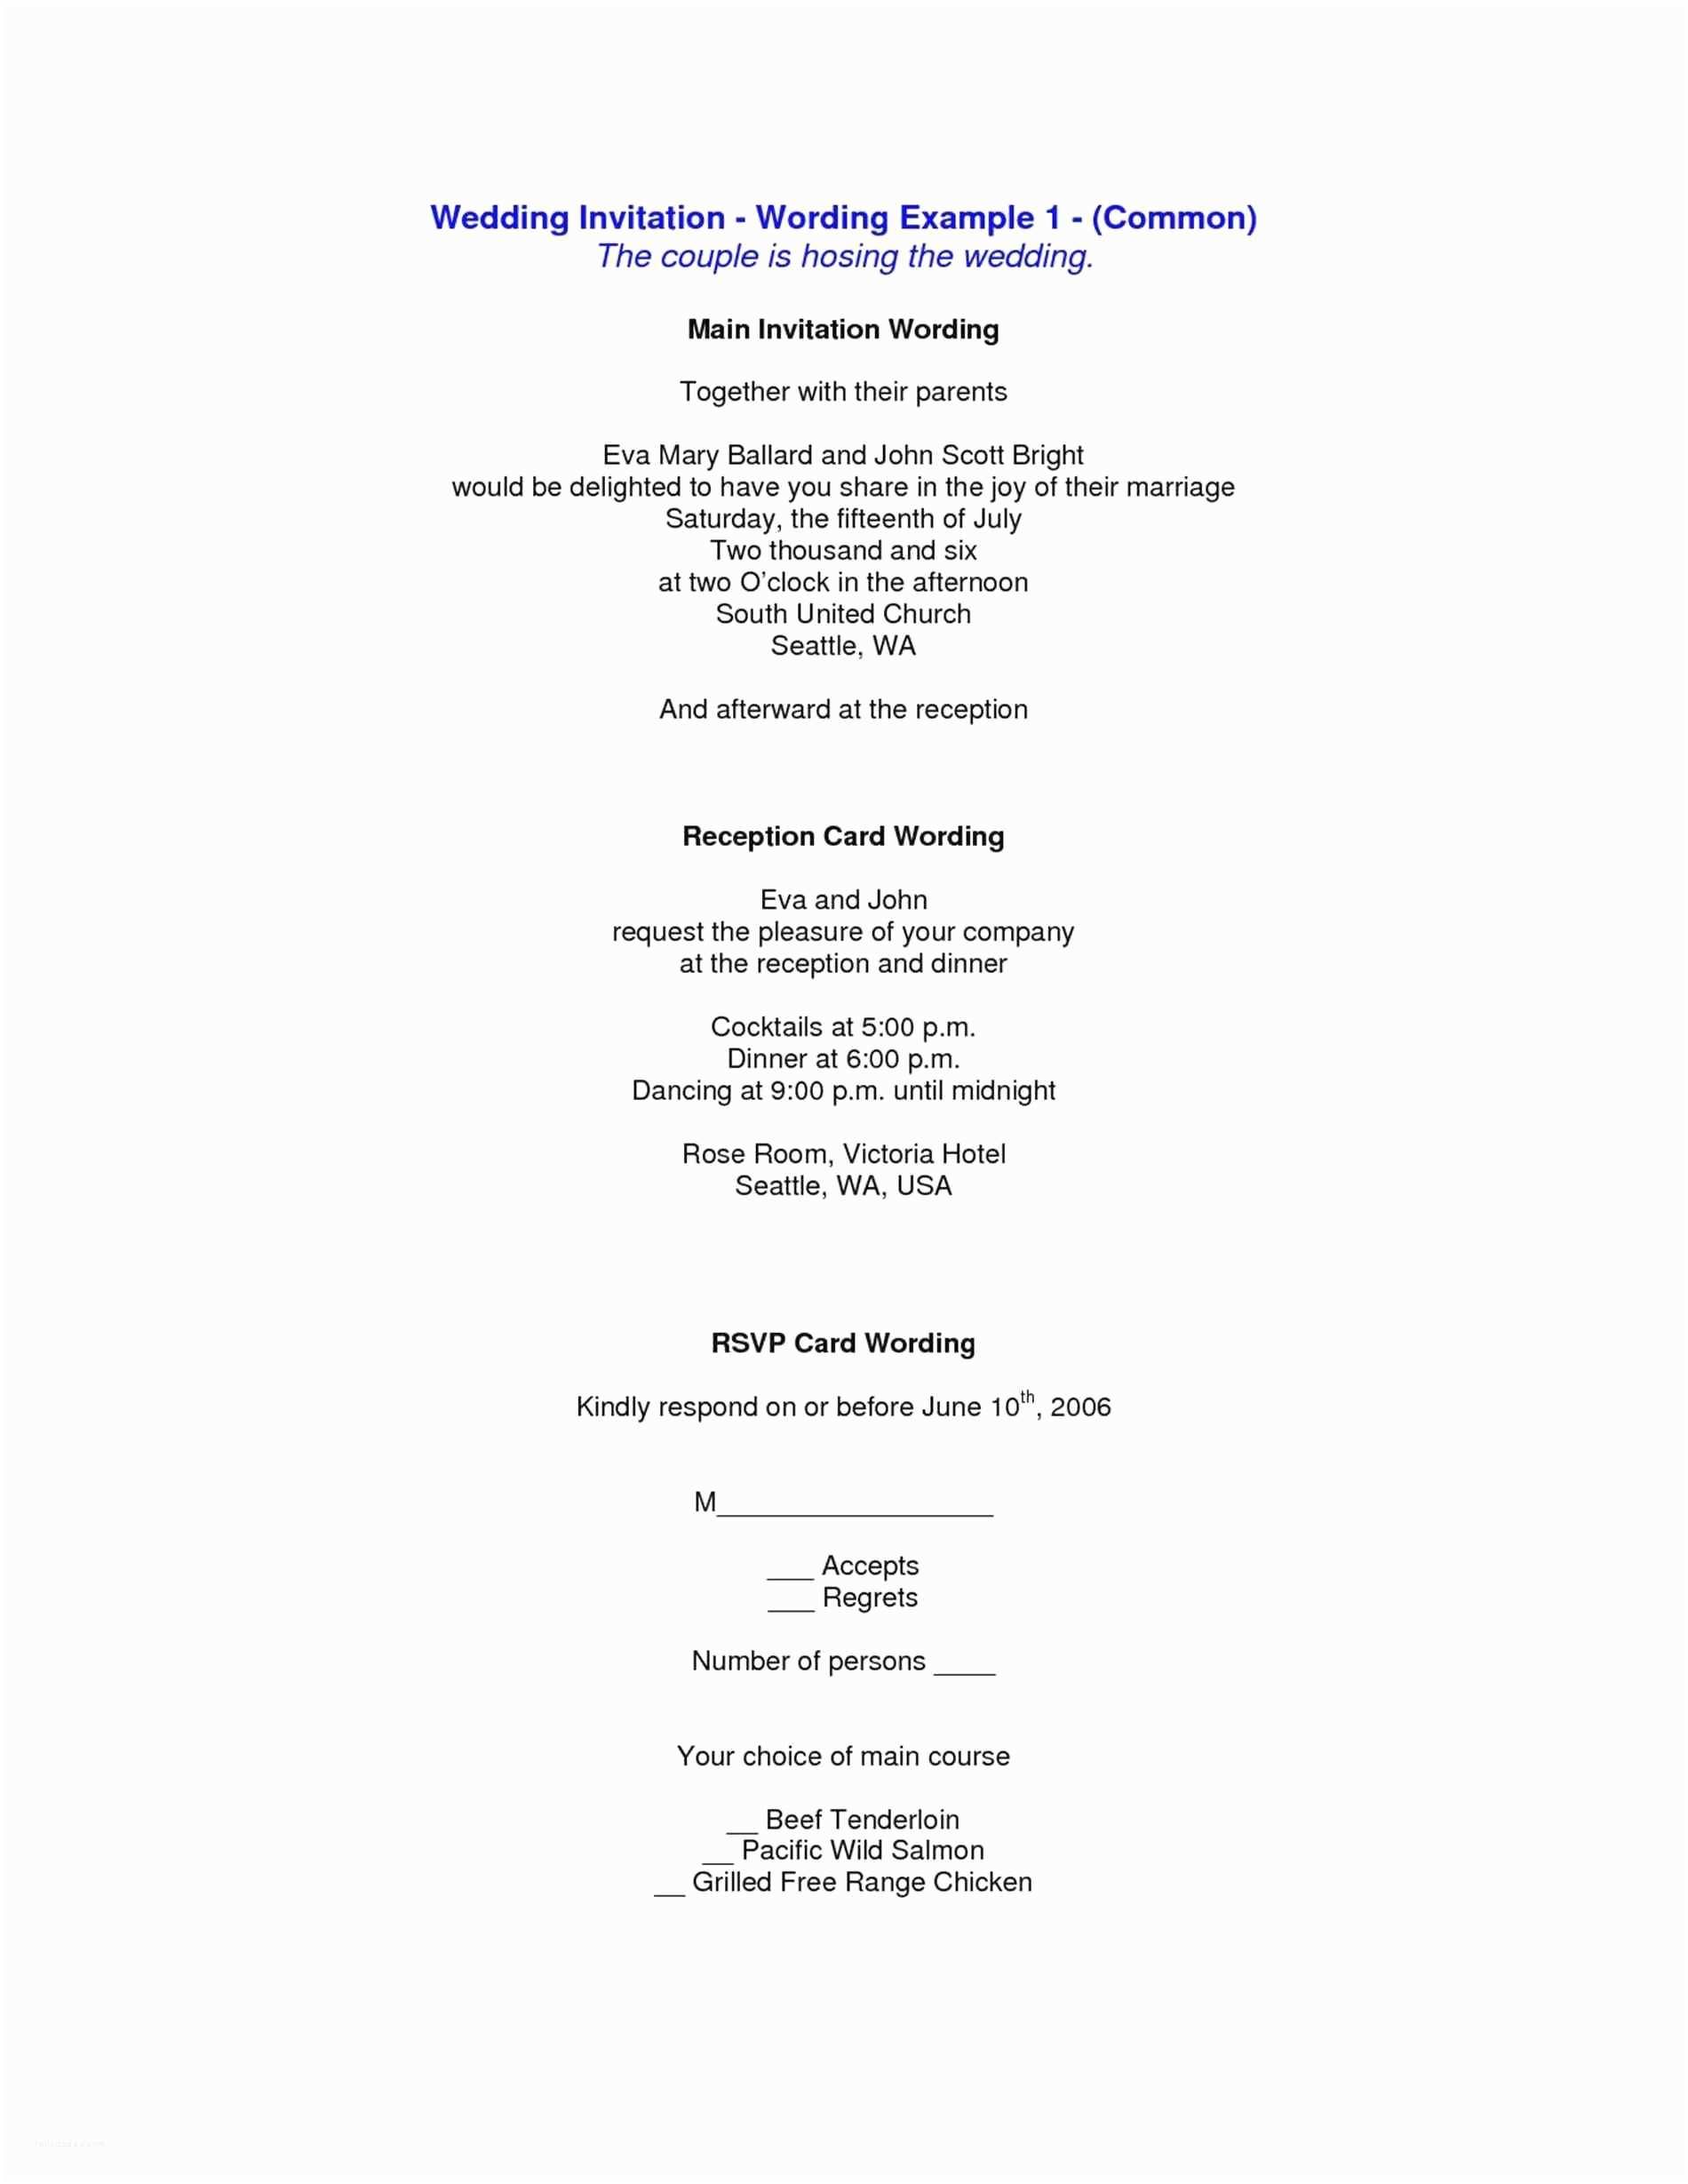 Emily Post Wedding Invitation Wording Sample Wedding Invitation Wording with Reception